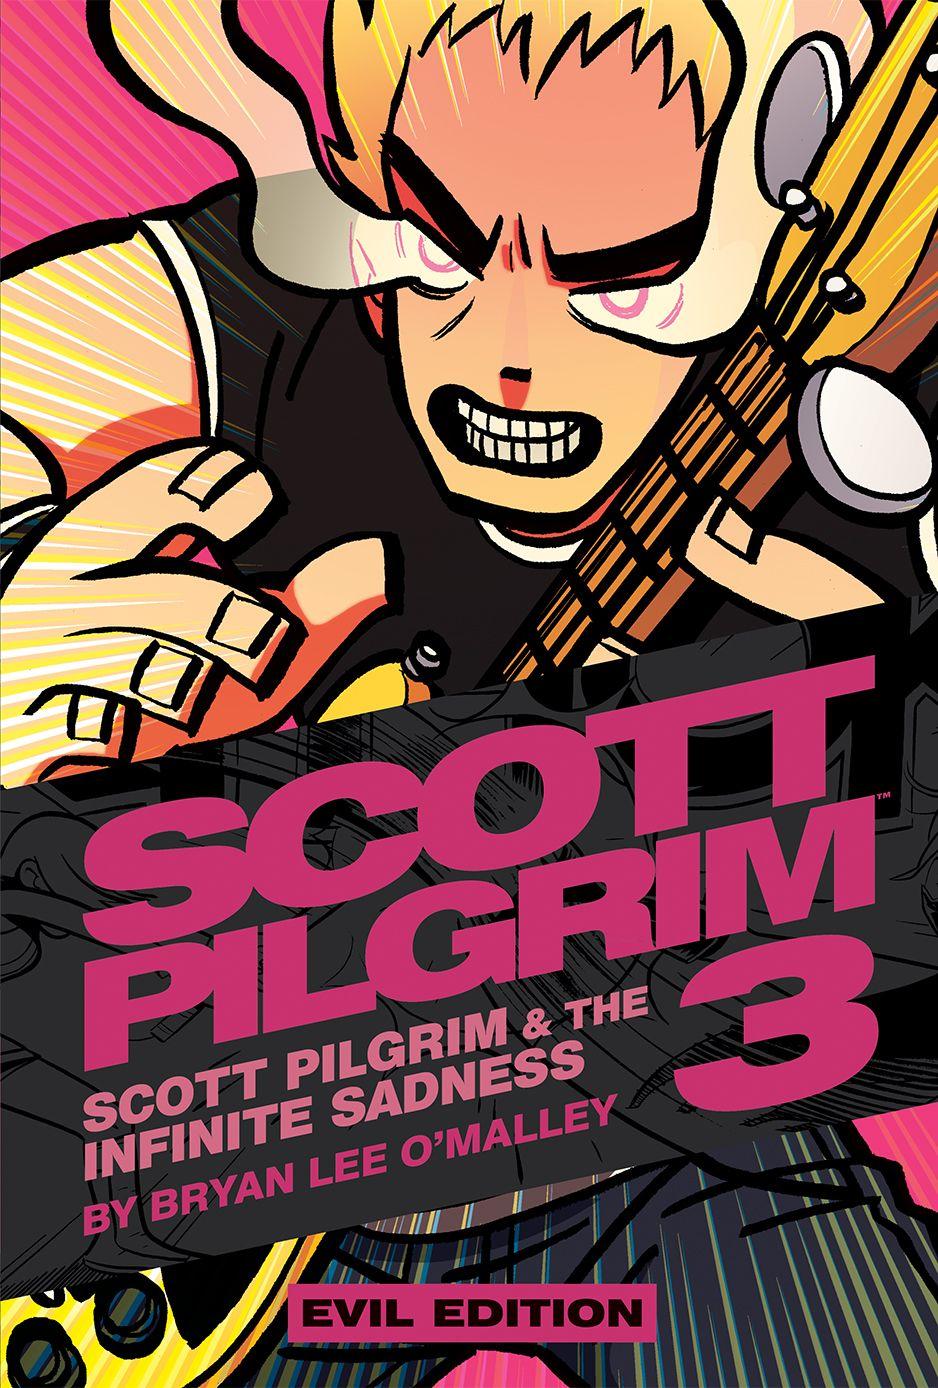 Scott Pilgrim color hardcover - Evil Edition | Comic booked ...